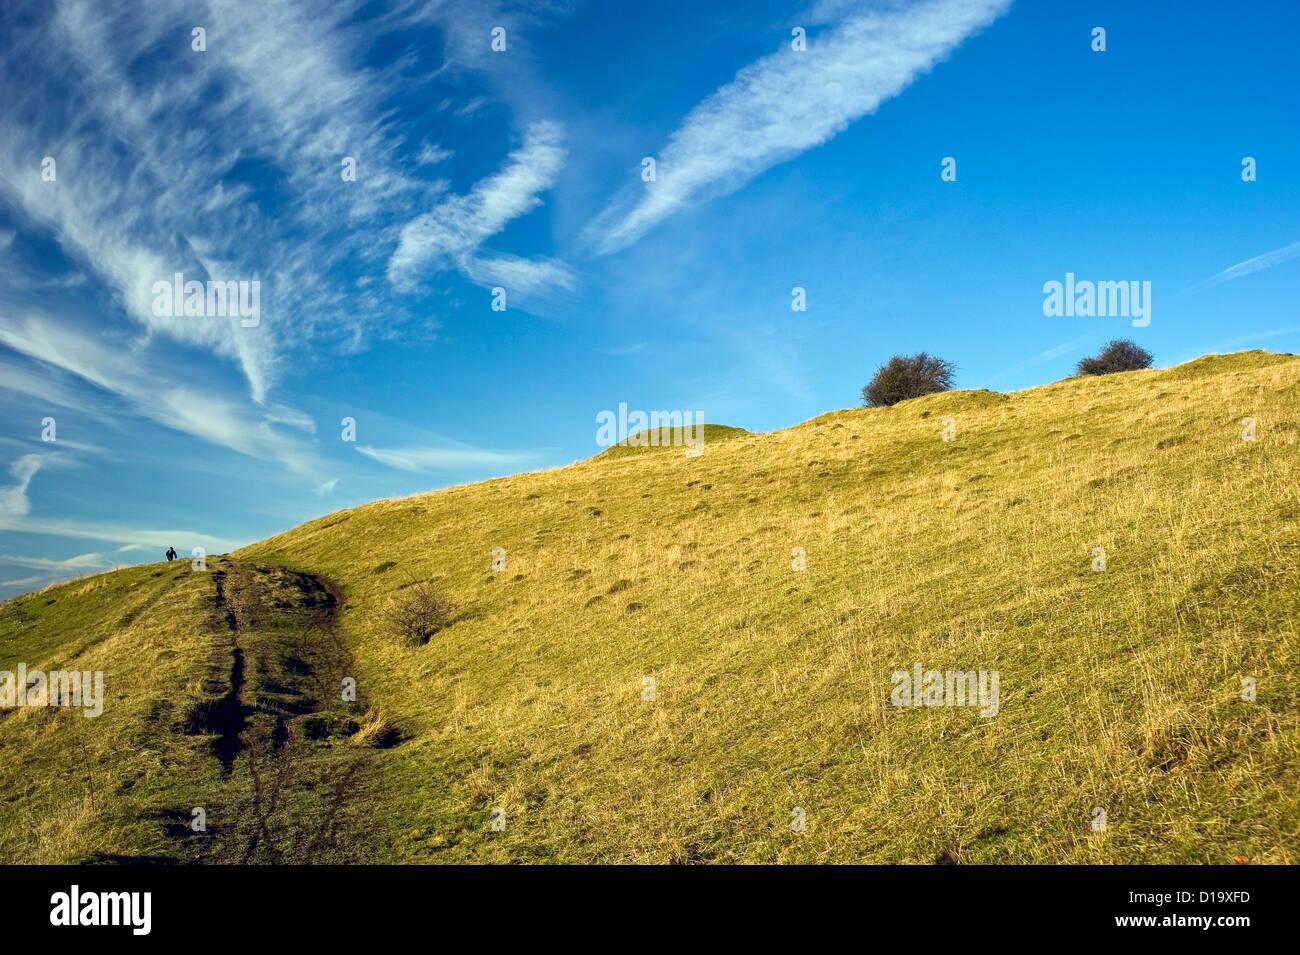 Pitstone Hill on The Ridgeway National Trail, Buckinghamshire, UK - Stock Image